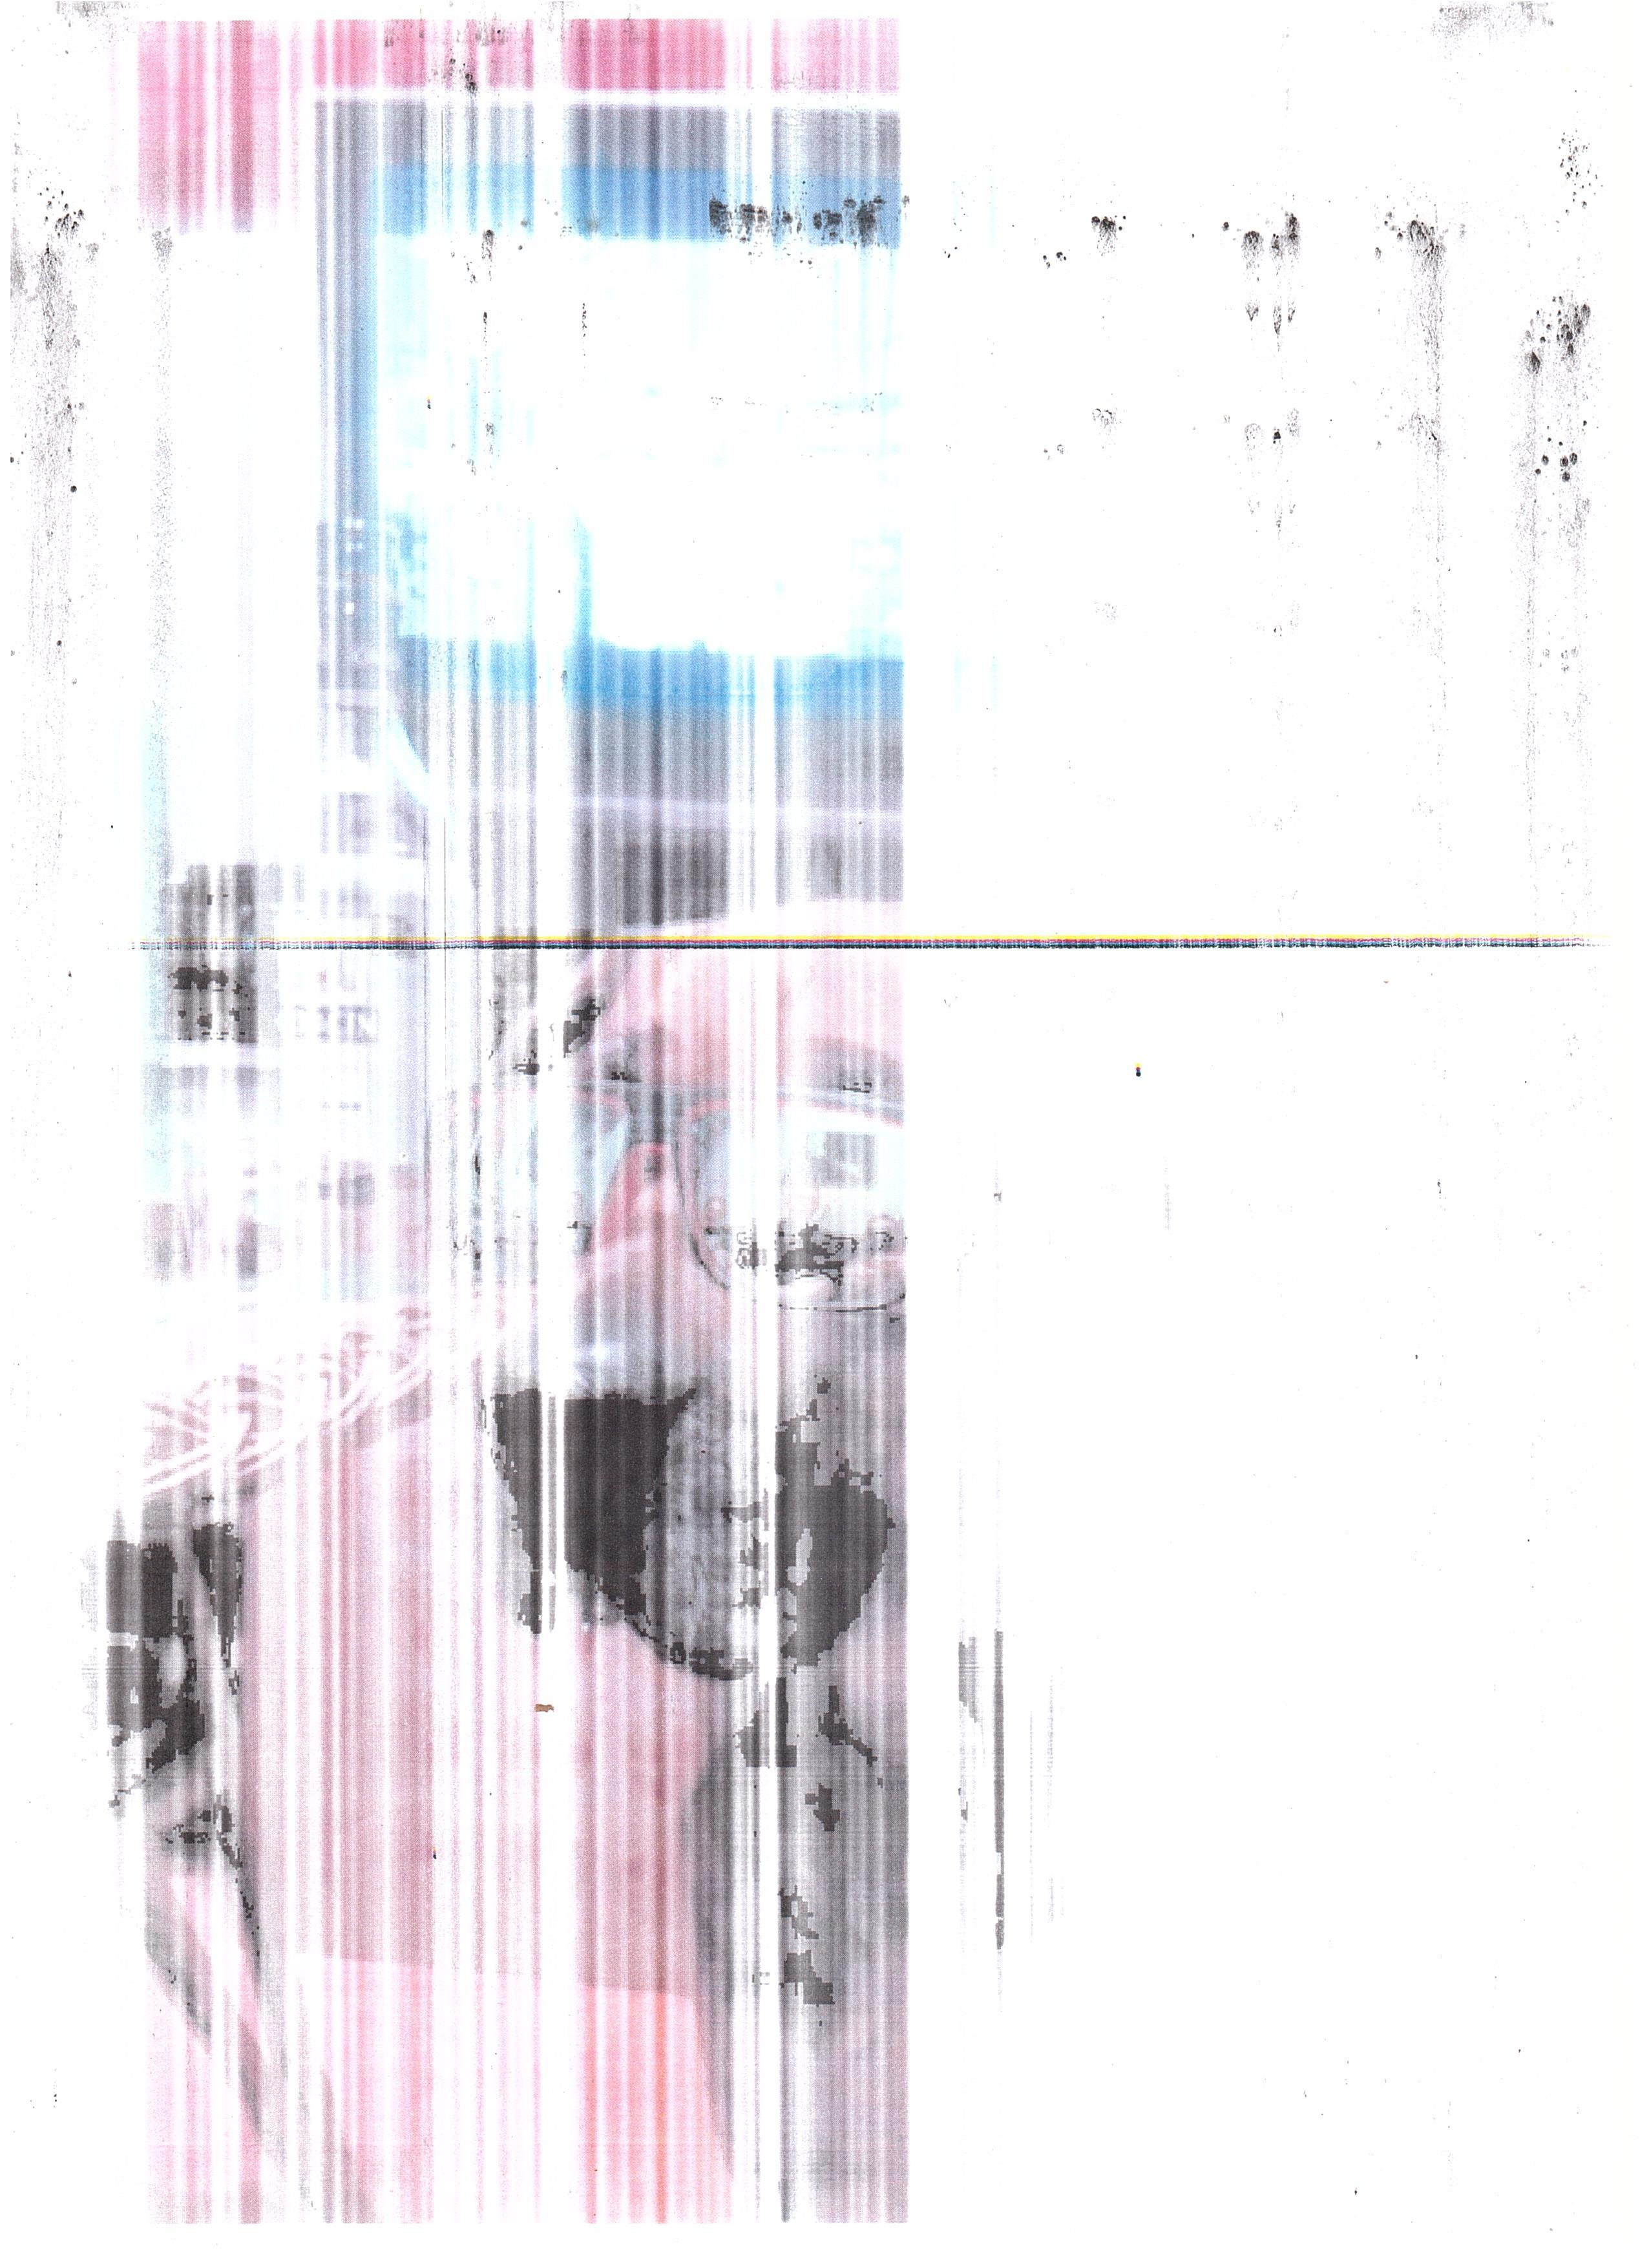 Samsung clx-3180 - Paski pionowe i poziome